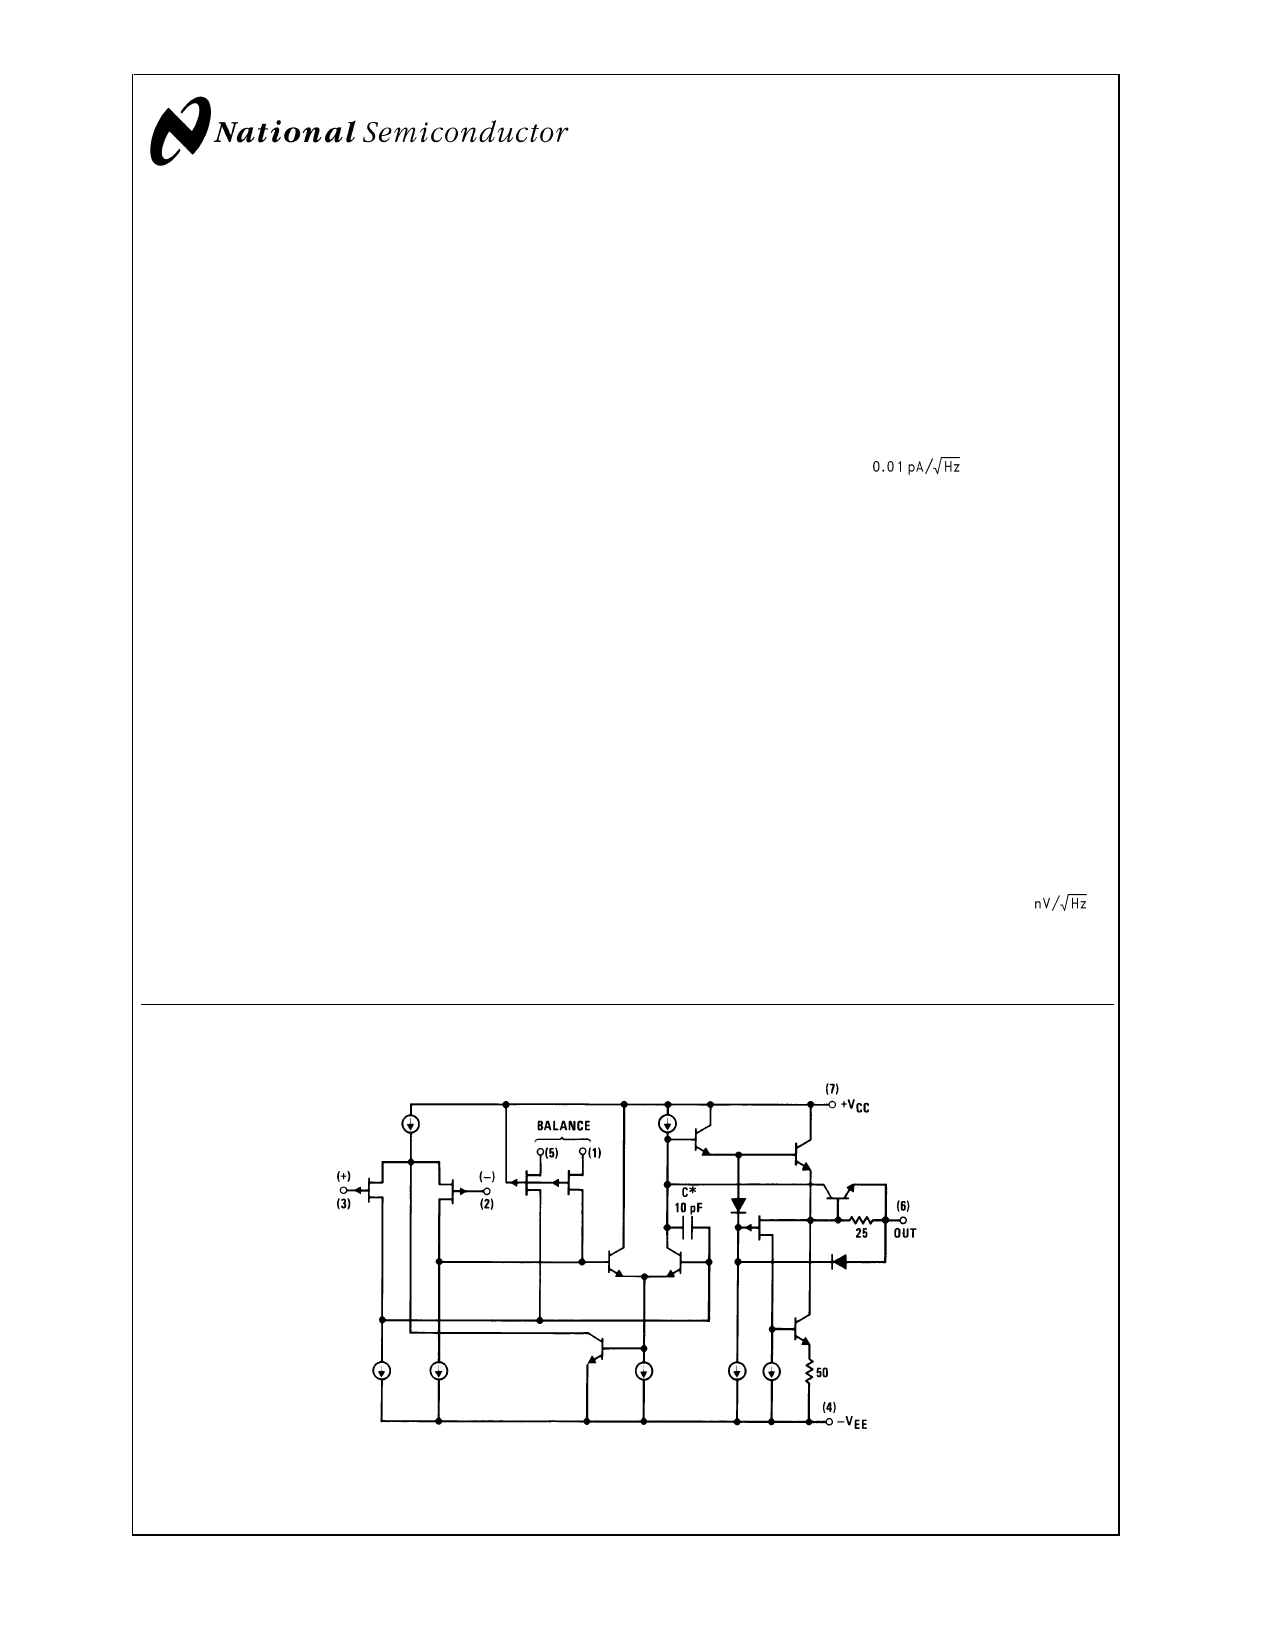 LF156 데이터시트 및 LF156 PDF